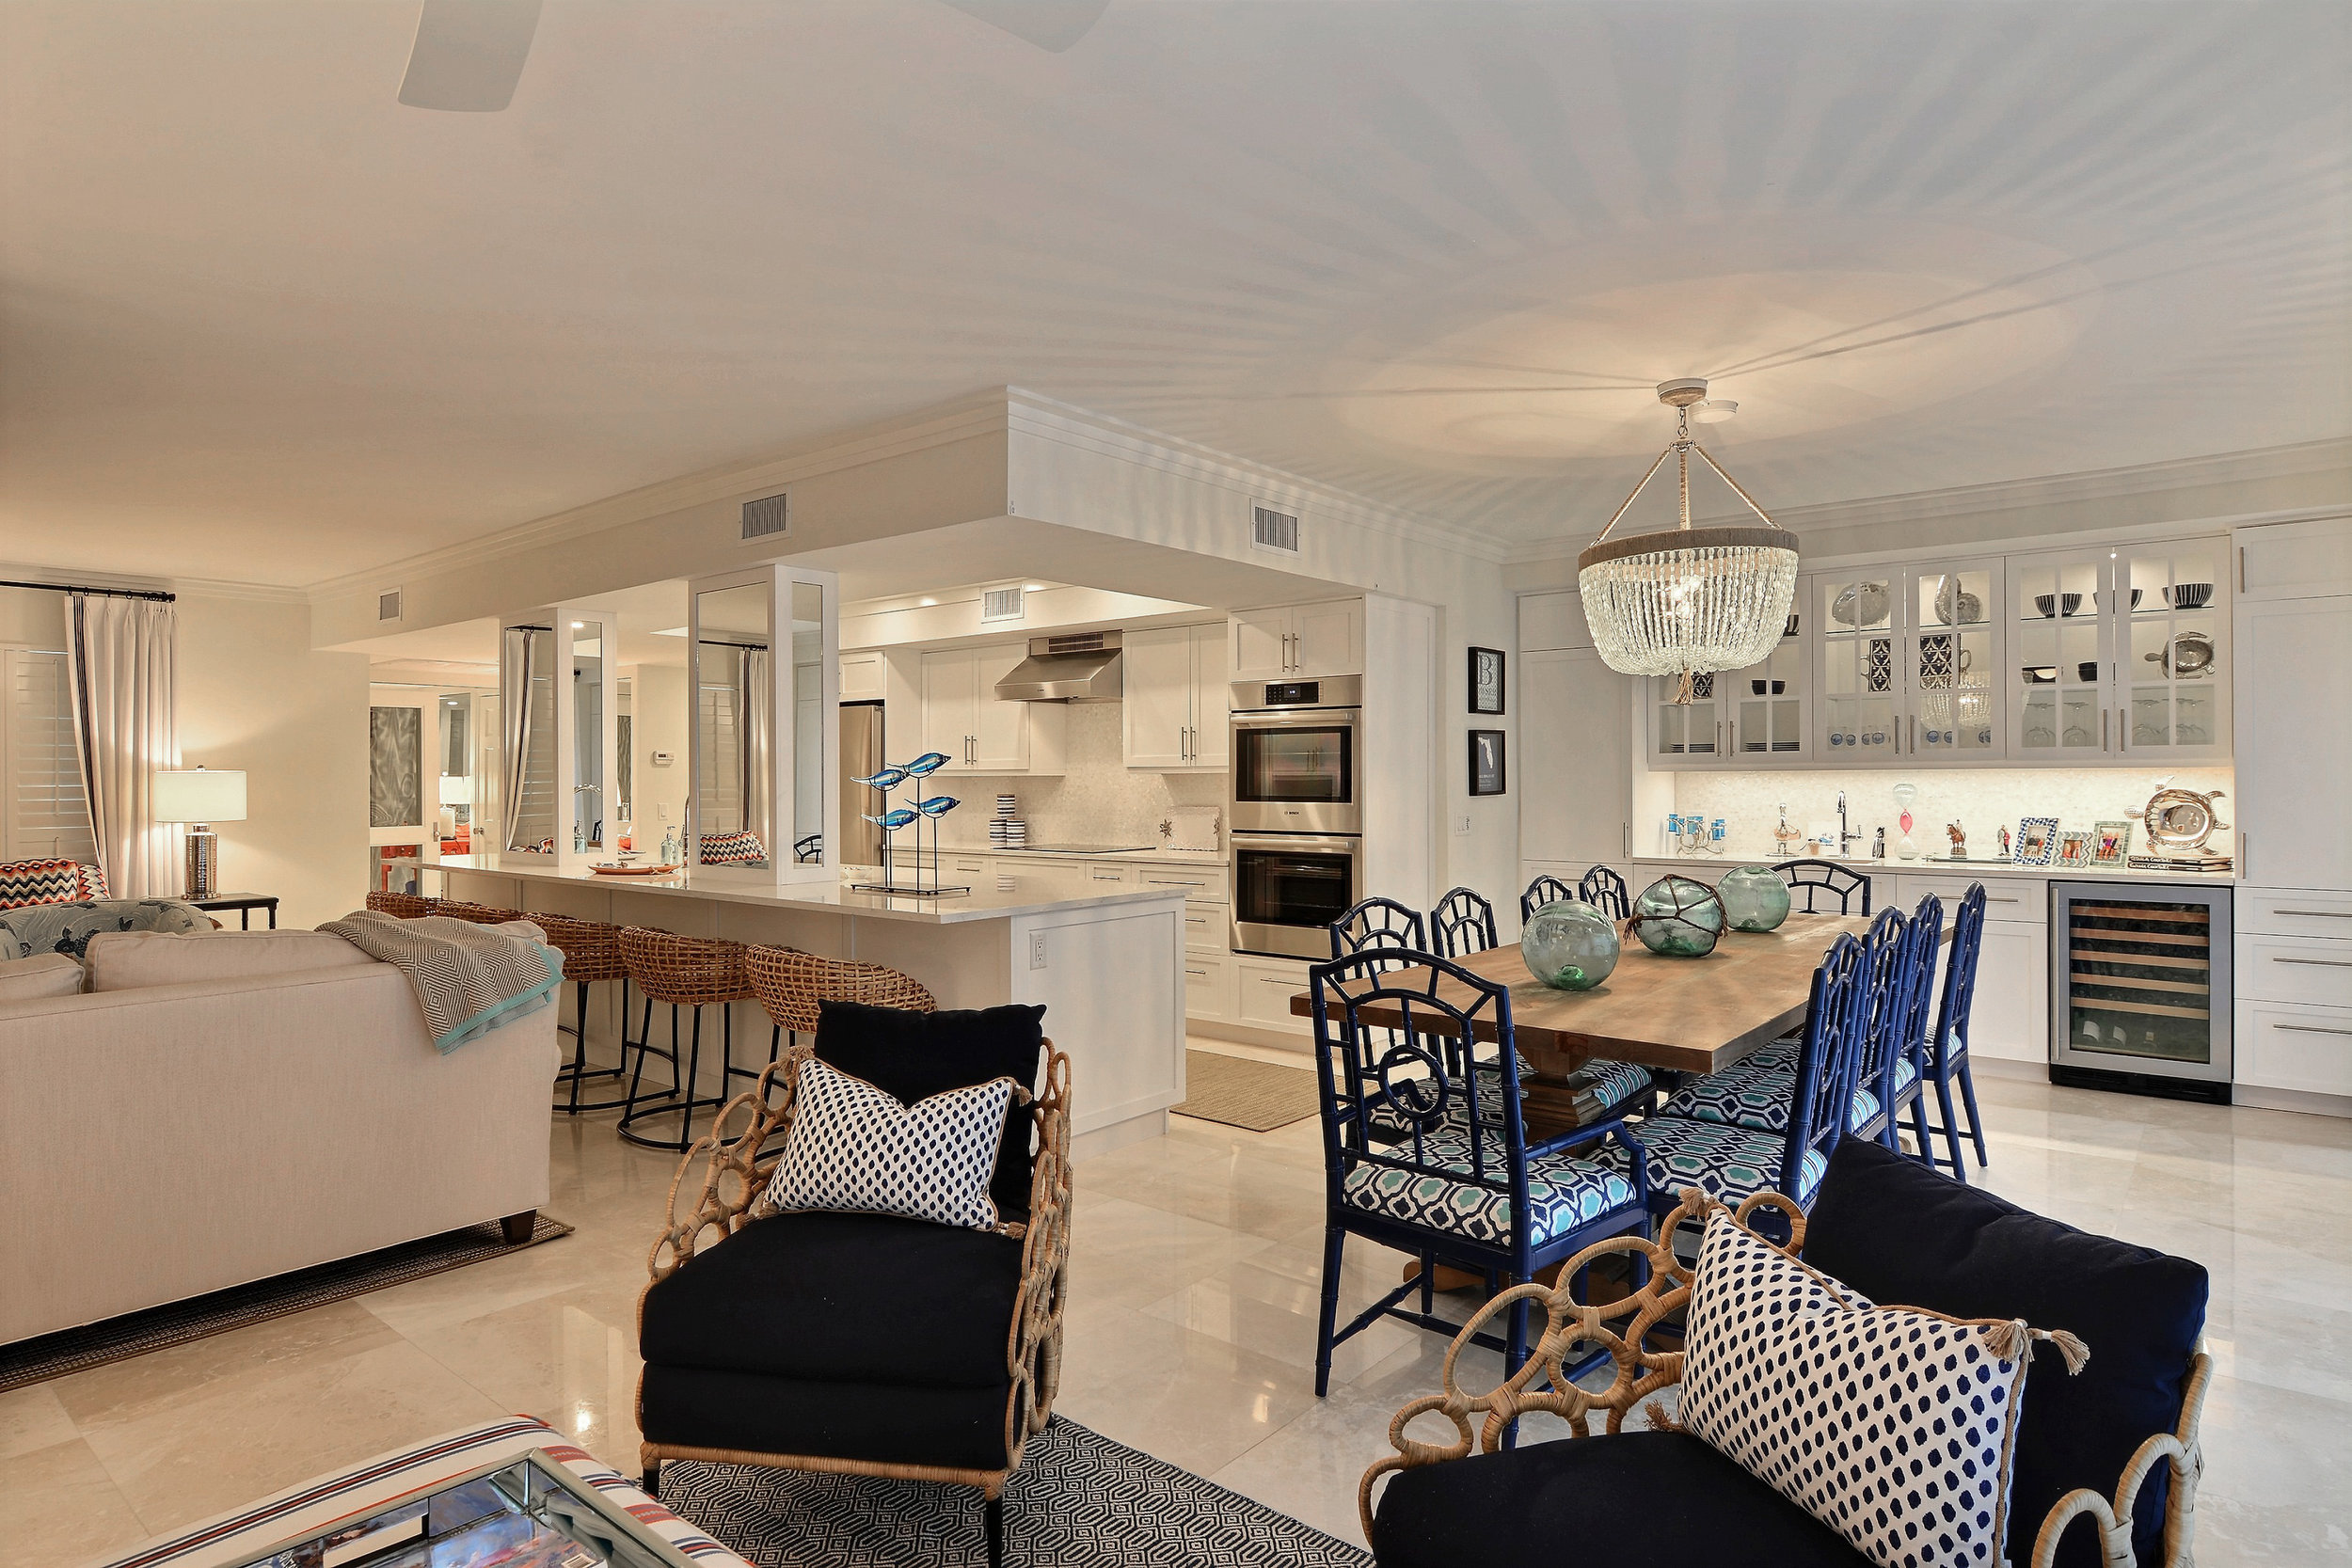 John's Island Condo | Vero Beach, FL